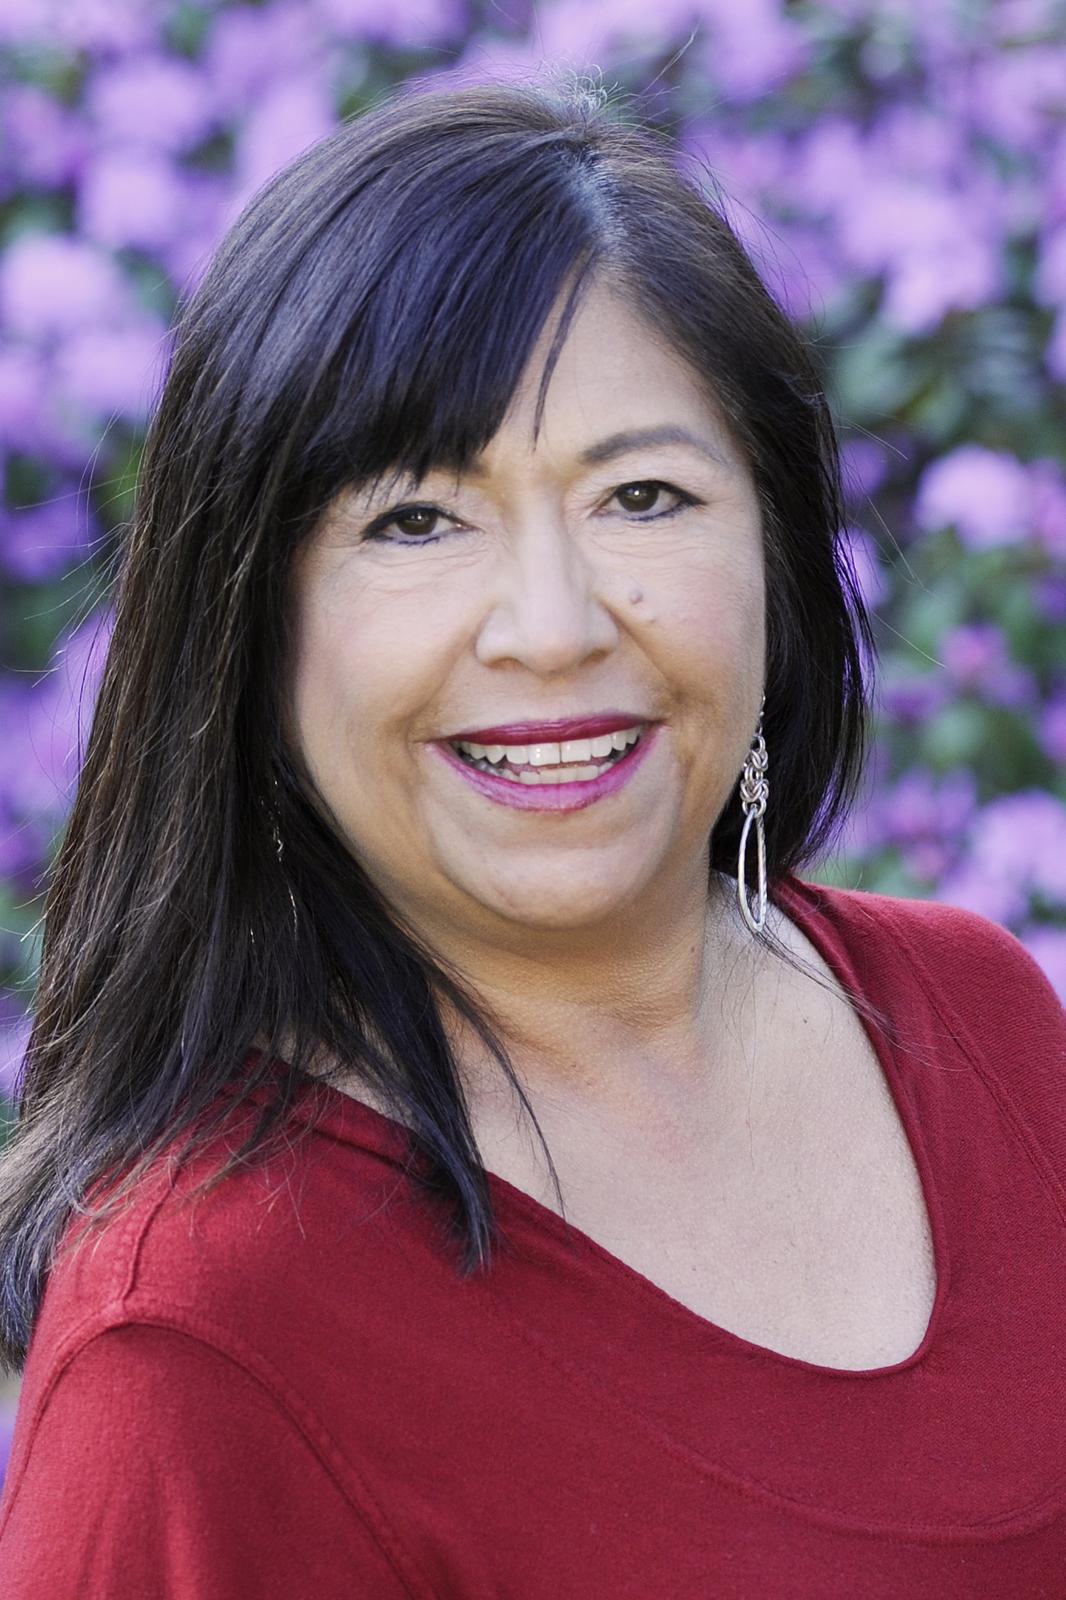 Julie Esparza Brown, PPS Zone 1